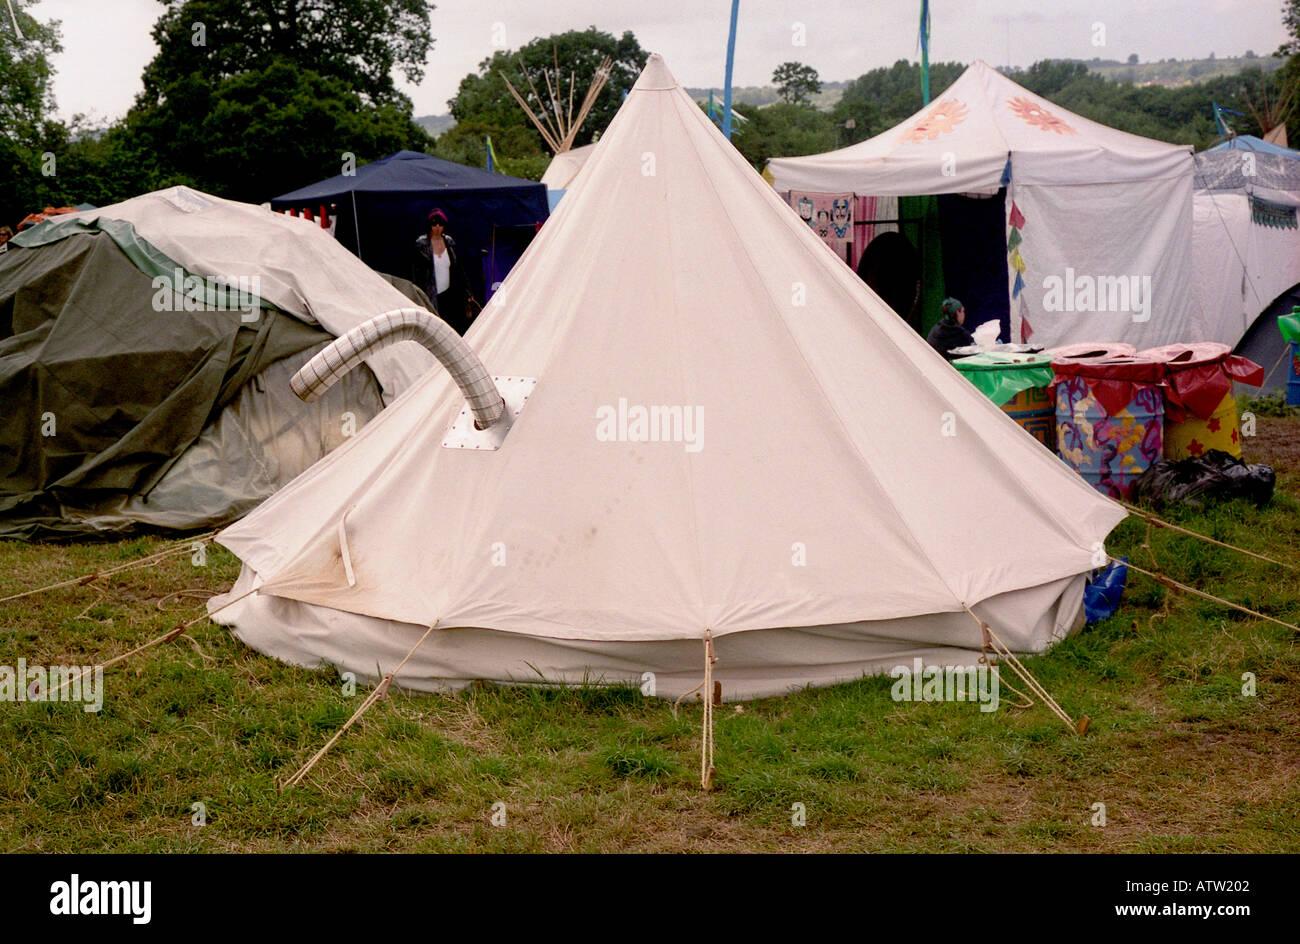 Tent with chimney Glastonbury Festival 2004 & Tent with chimney Glastonbury Festival 2004 Stock Photo Royalty ...